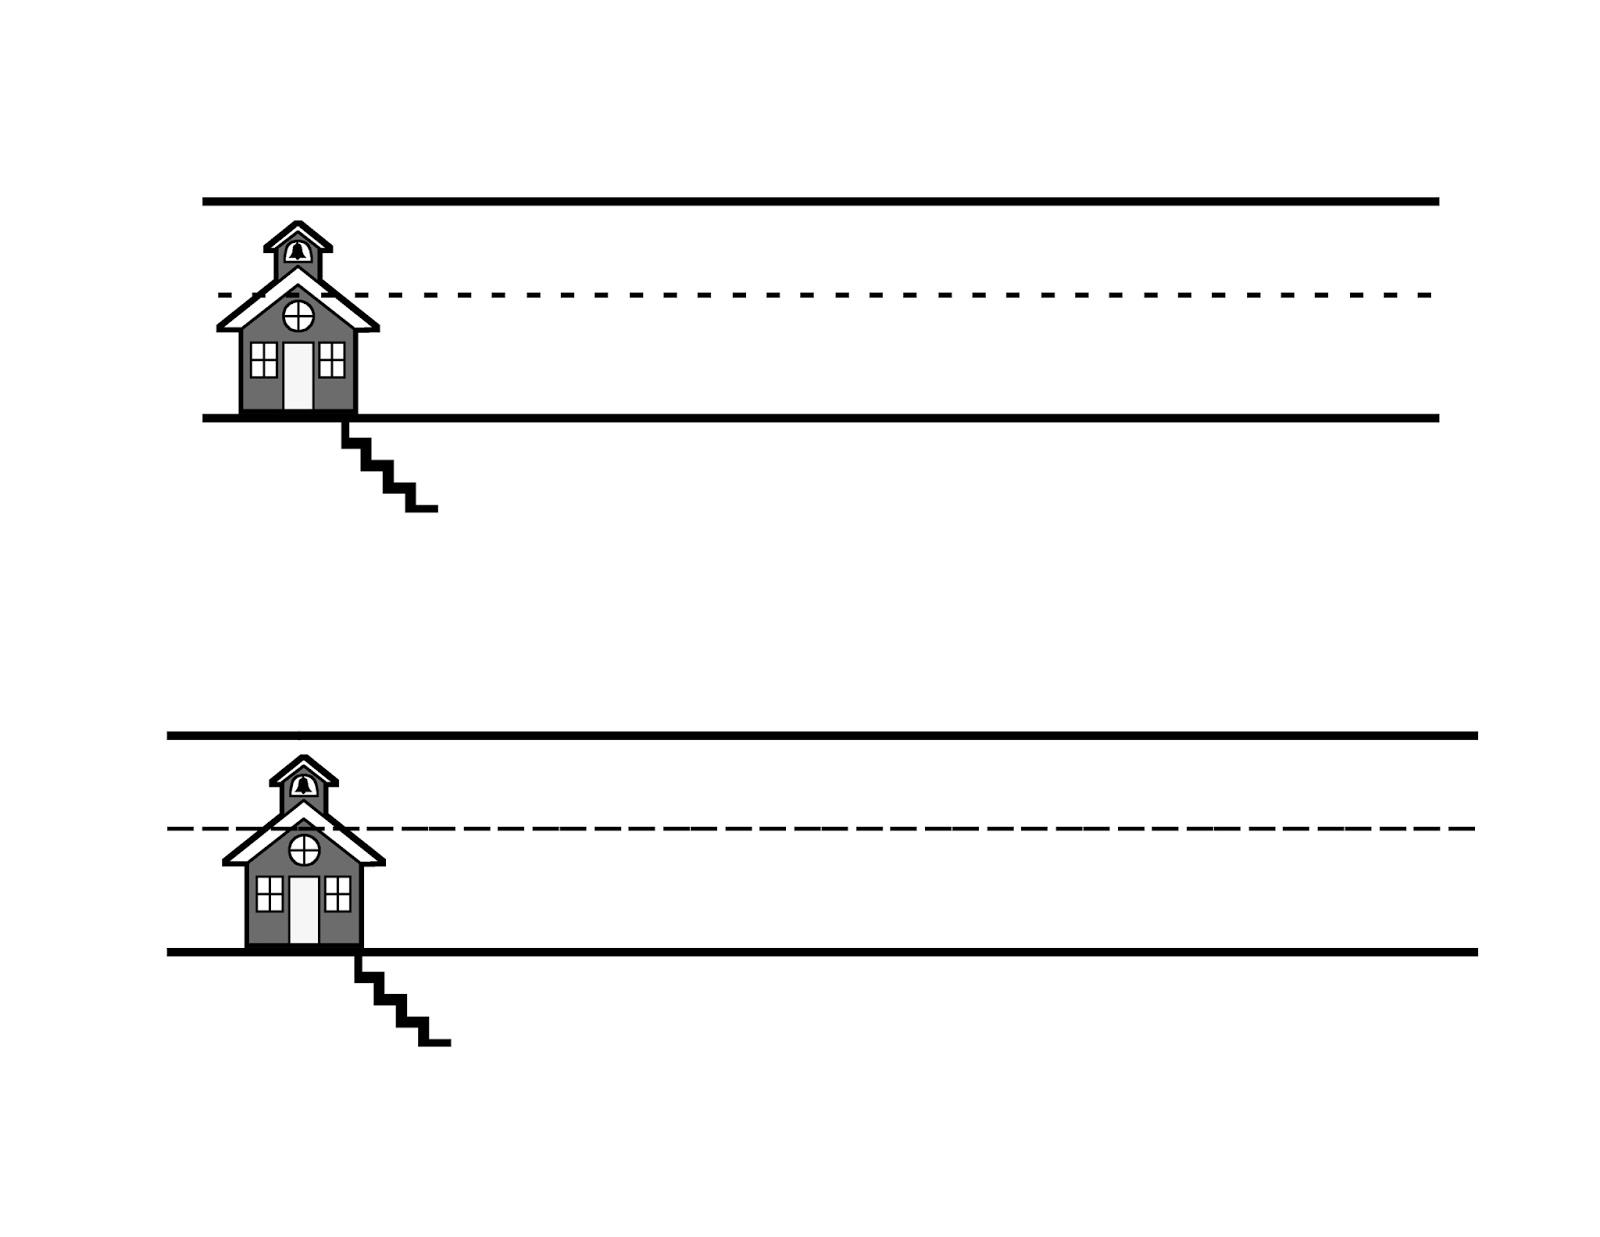 Blank Handwriting Worksheets For Kindergarten – Blank Handwriting Worksheets for Kindergarten